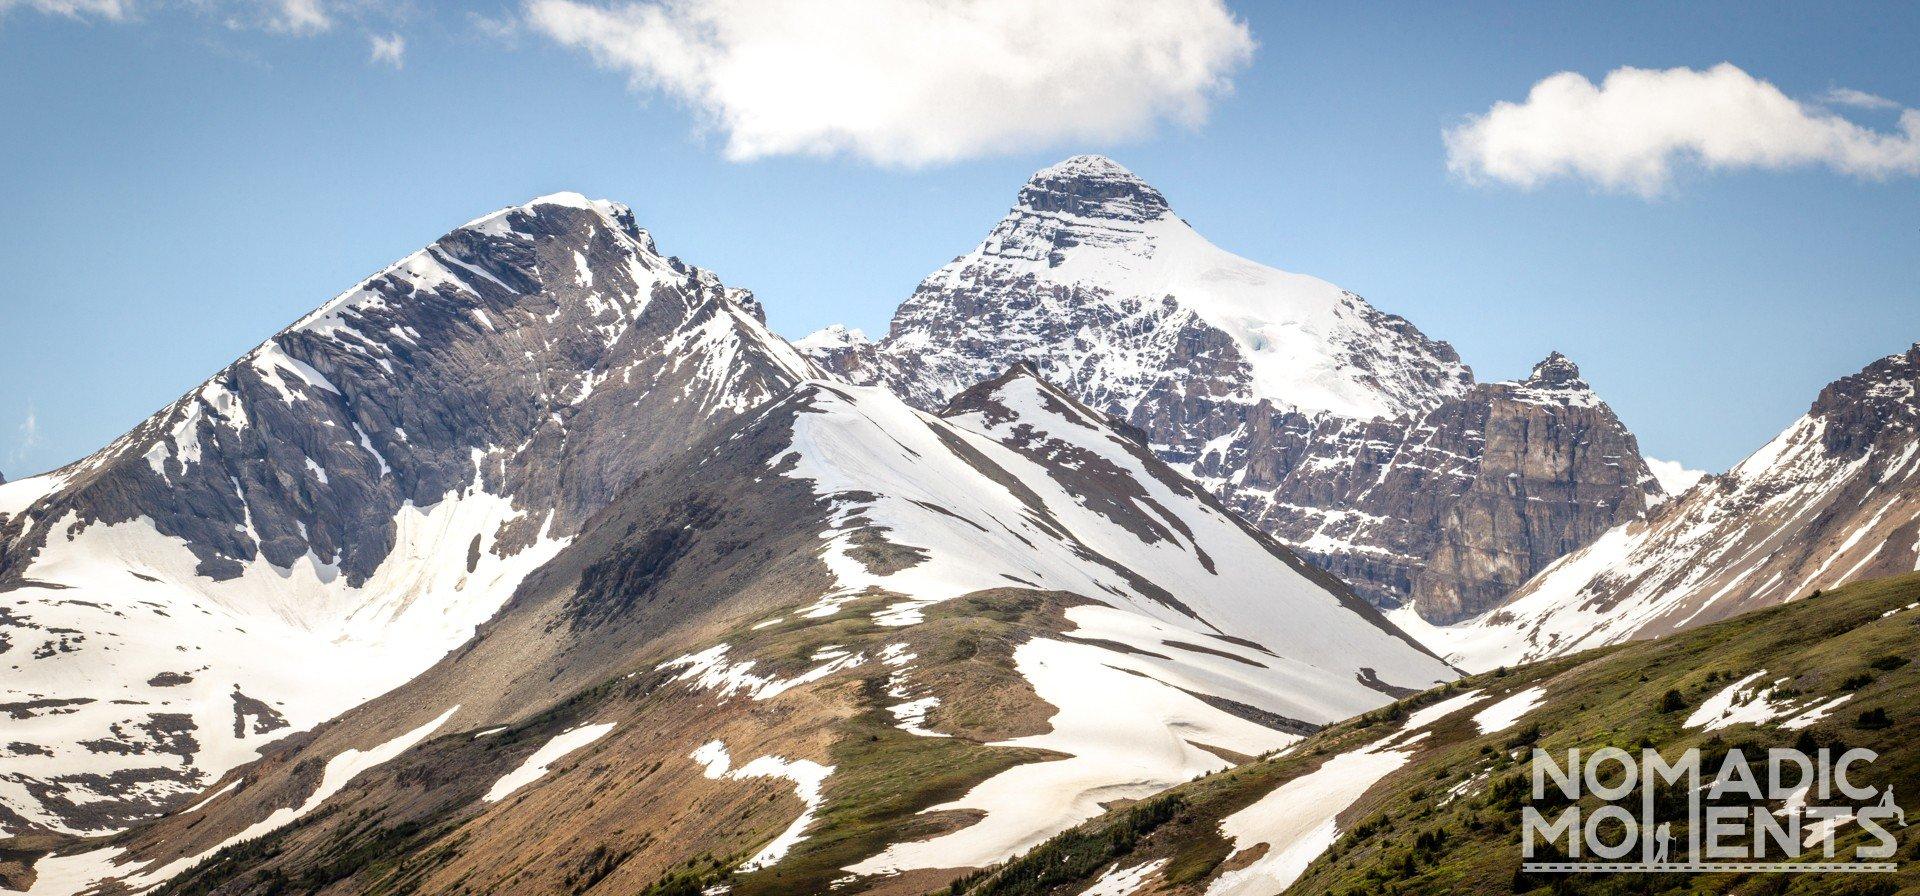 Mt. Athabasca